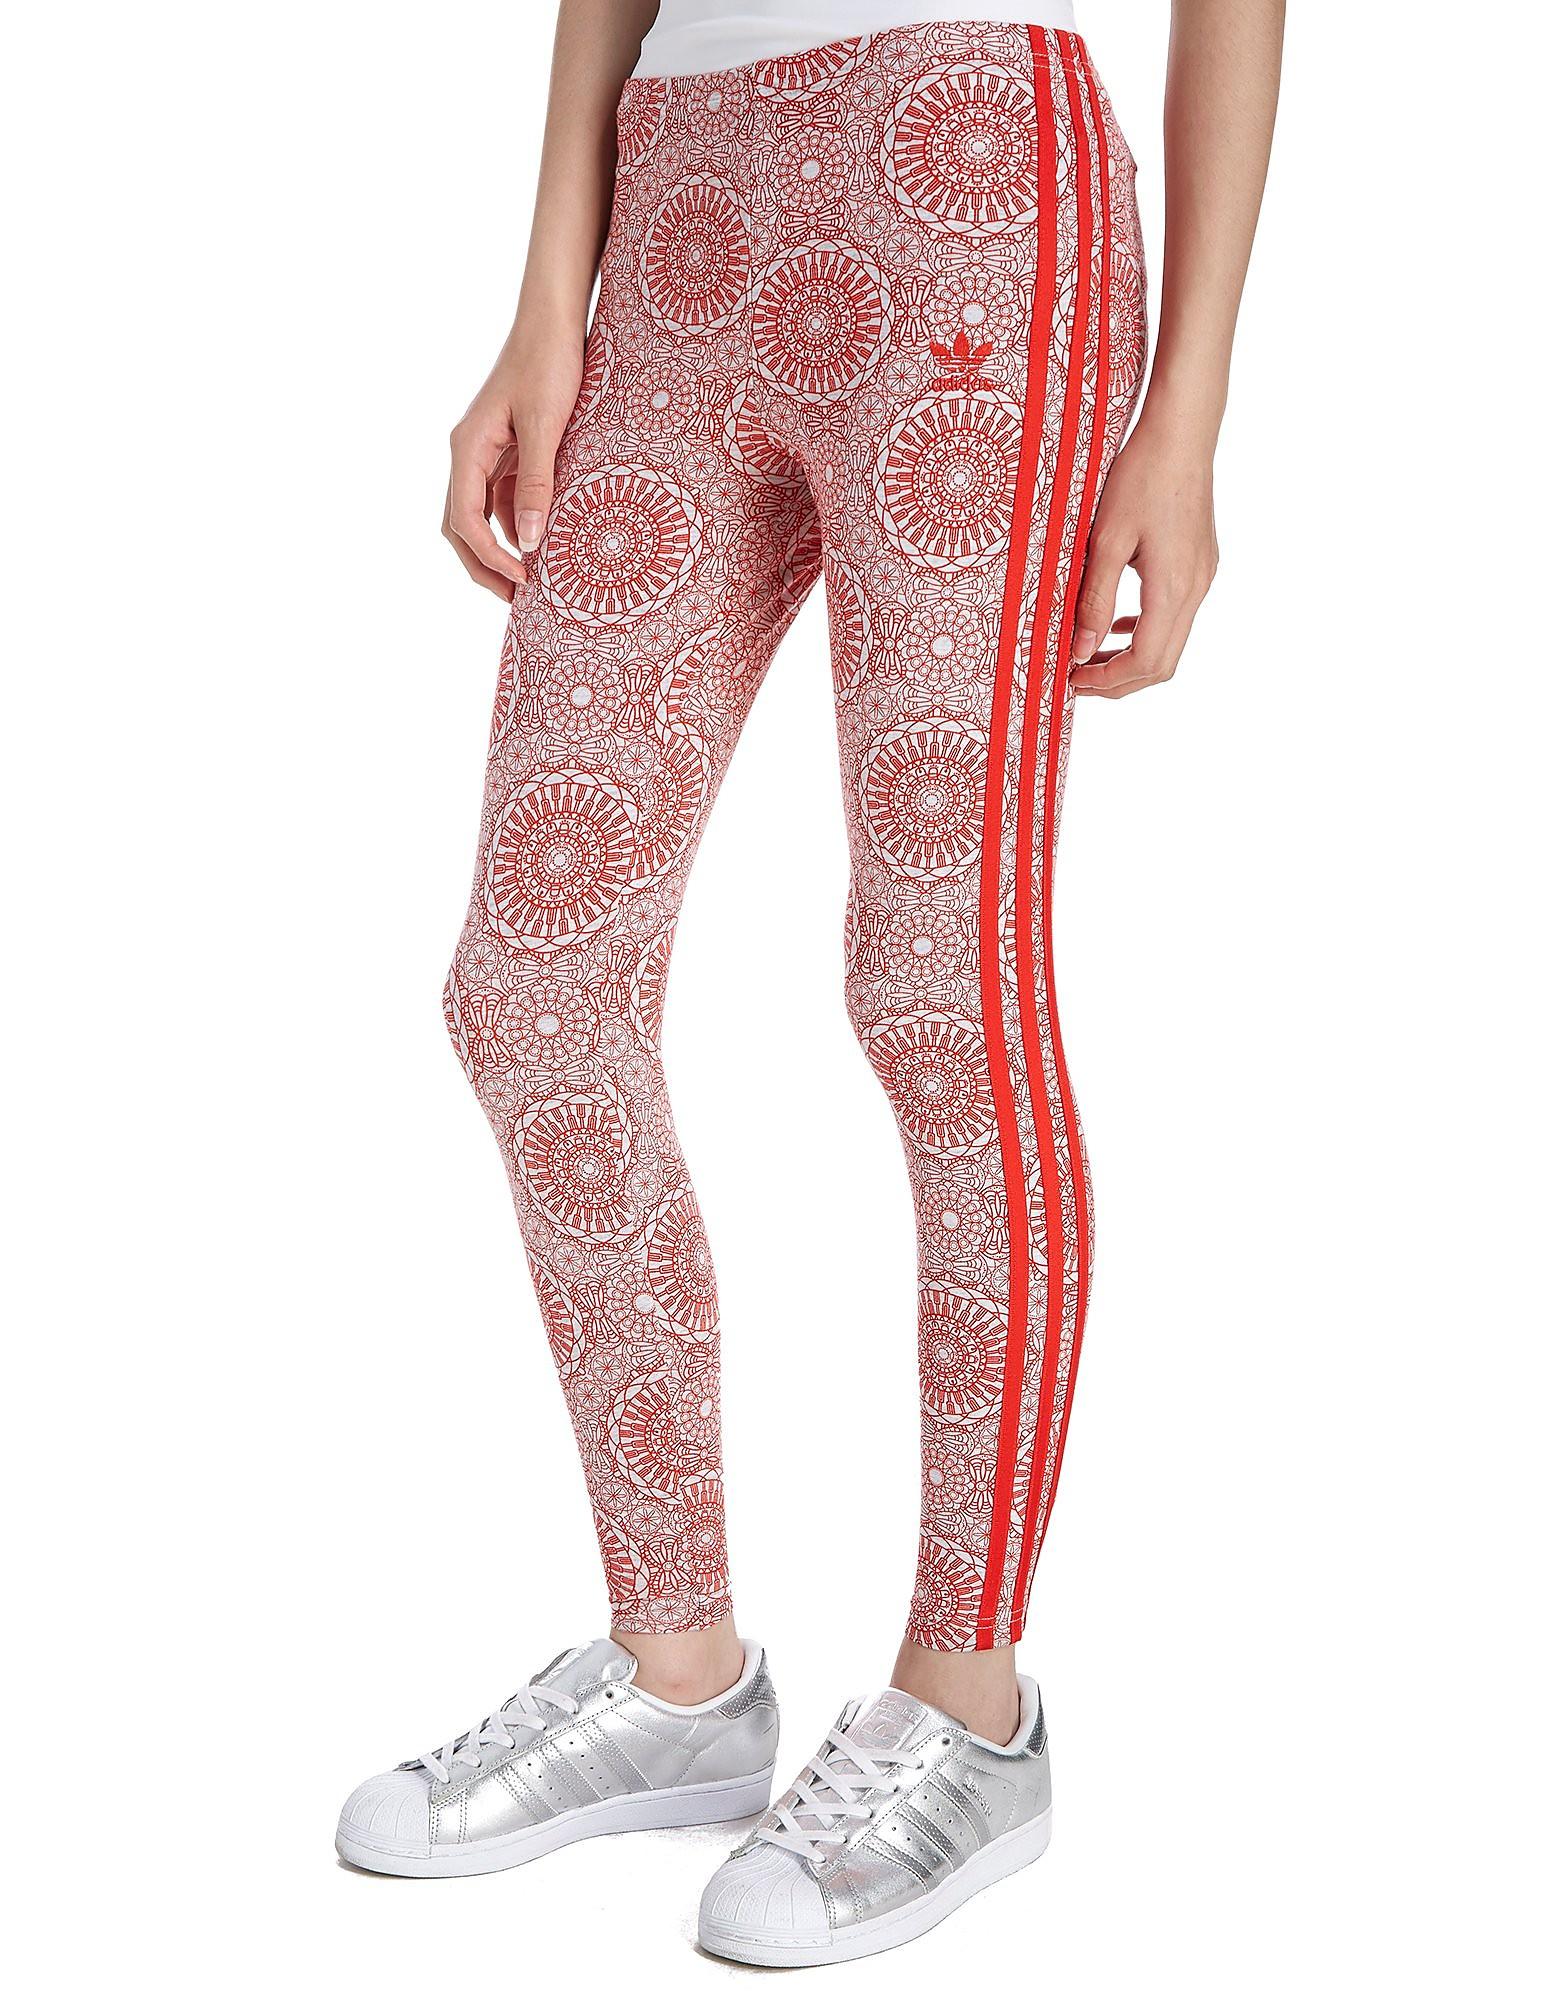 adidas Originals Pantalon Girls' London All-Over Print Junior